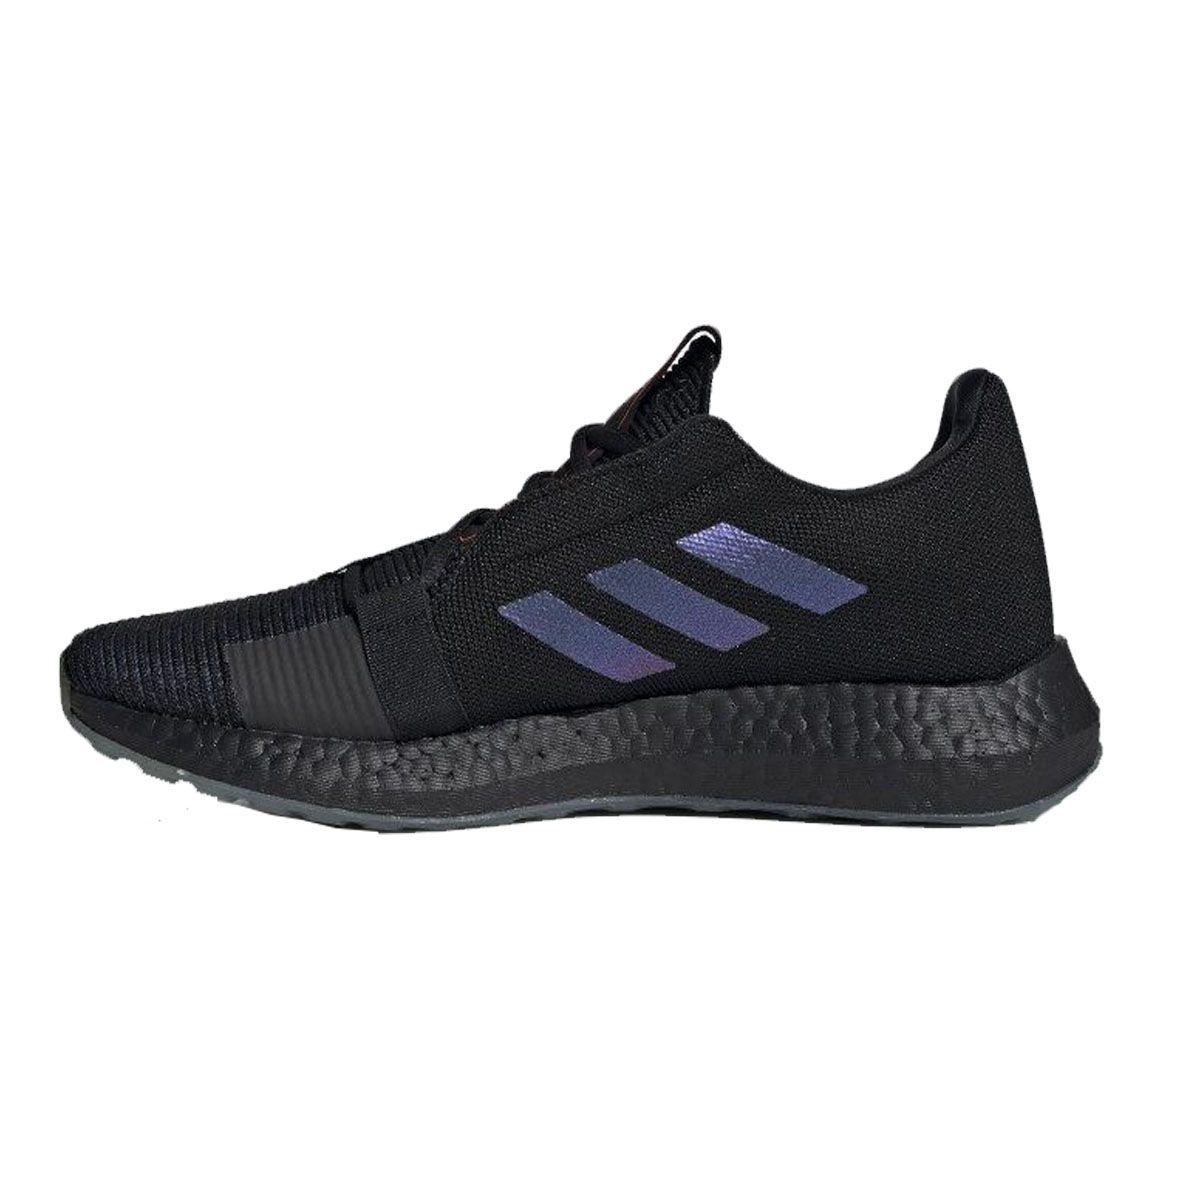 Tênis Adidas SenseBoost Go Masculino